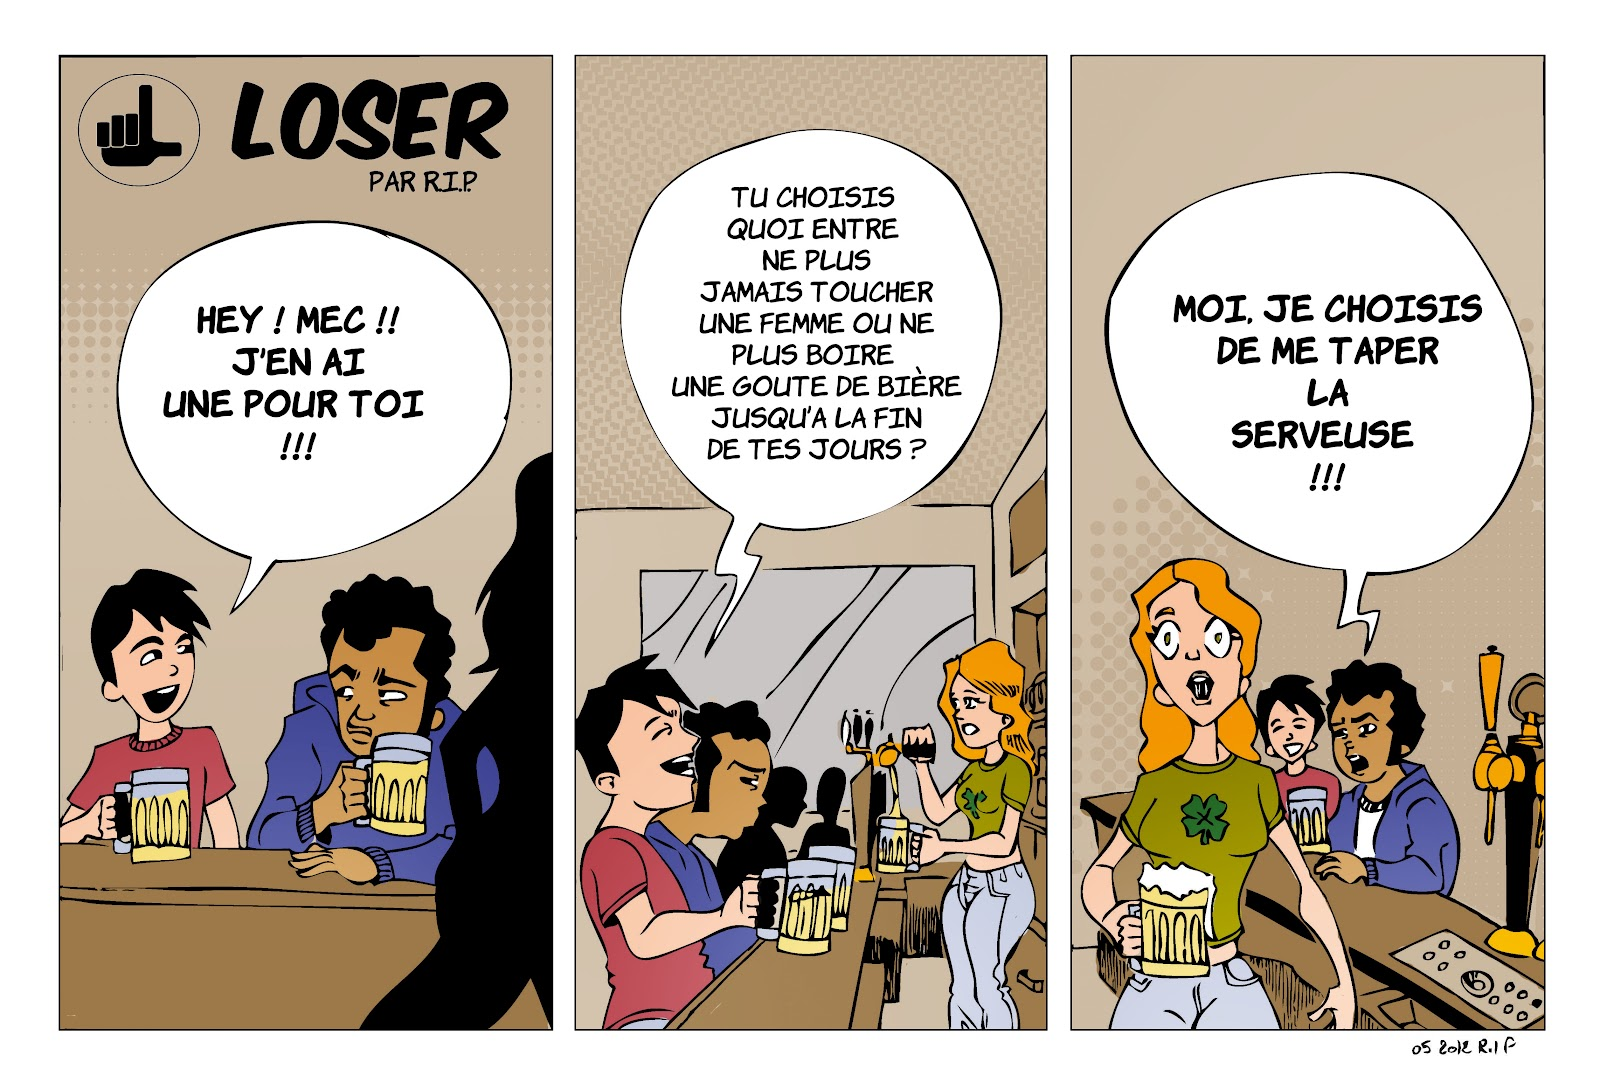 Alex Rip Illustrations / Bandes Dessinées: Loser 06